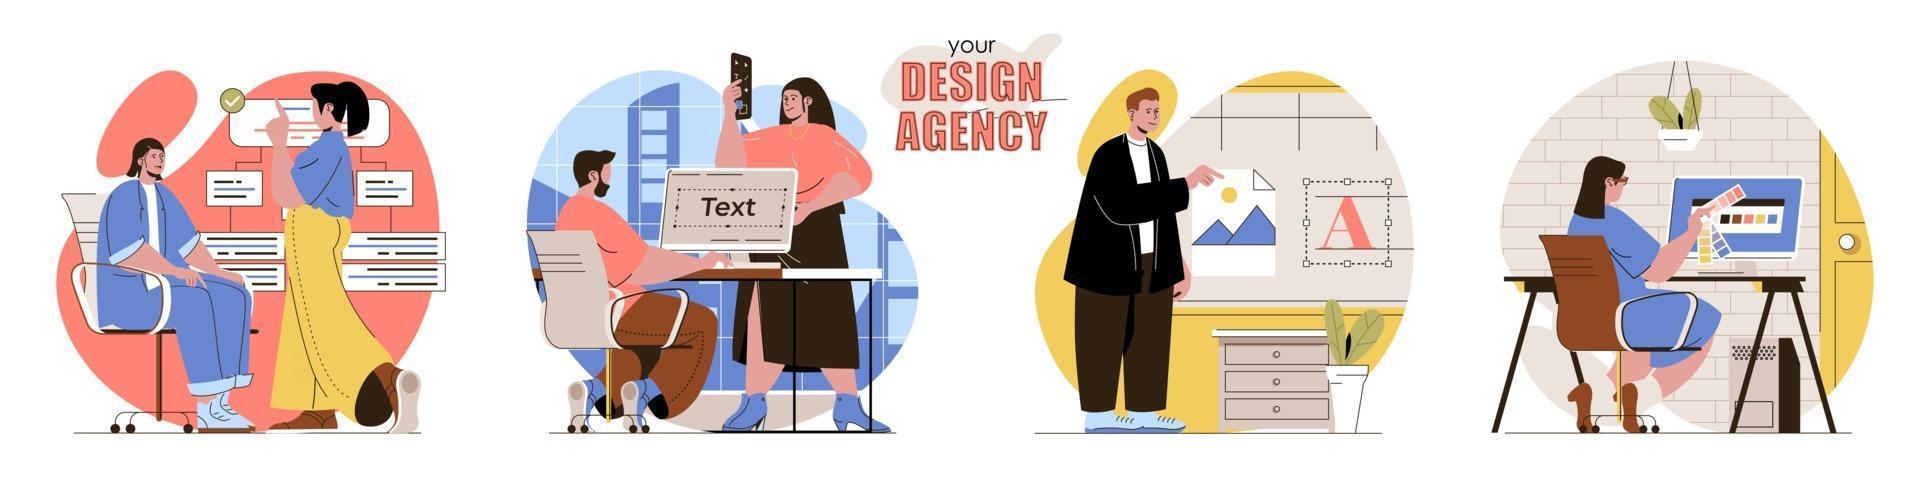 Your Design Agency concept scenes set vector